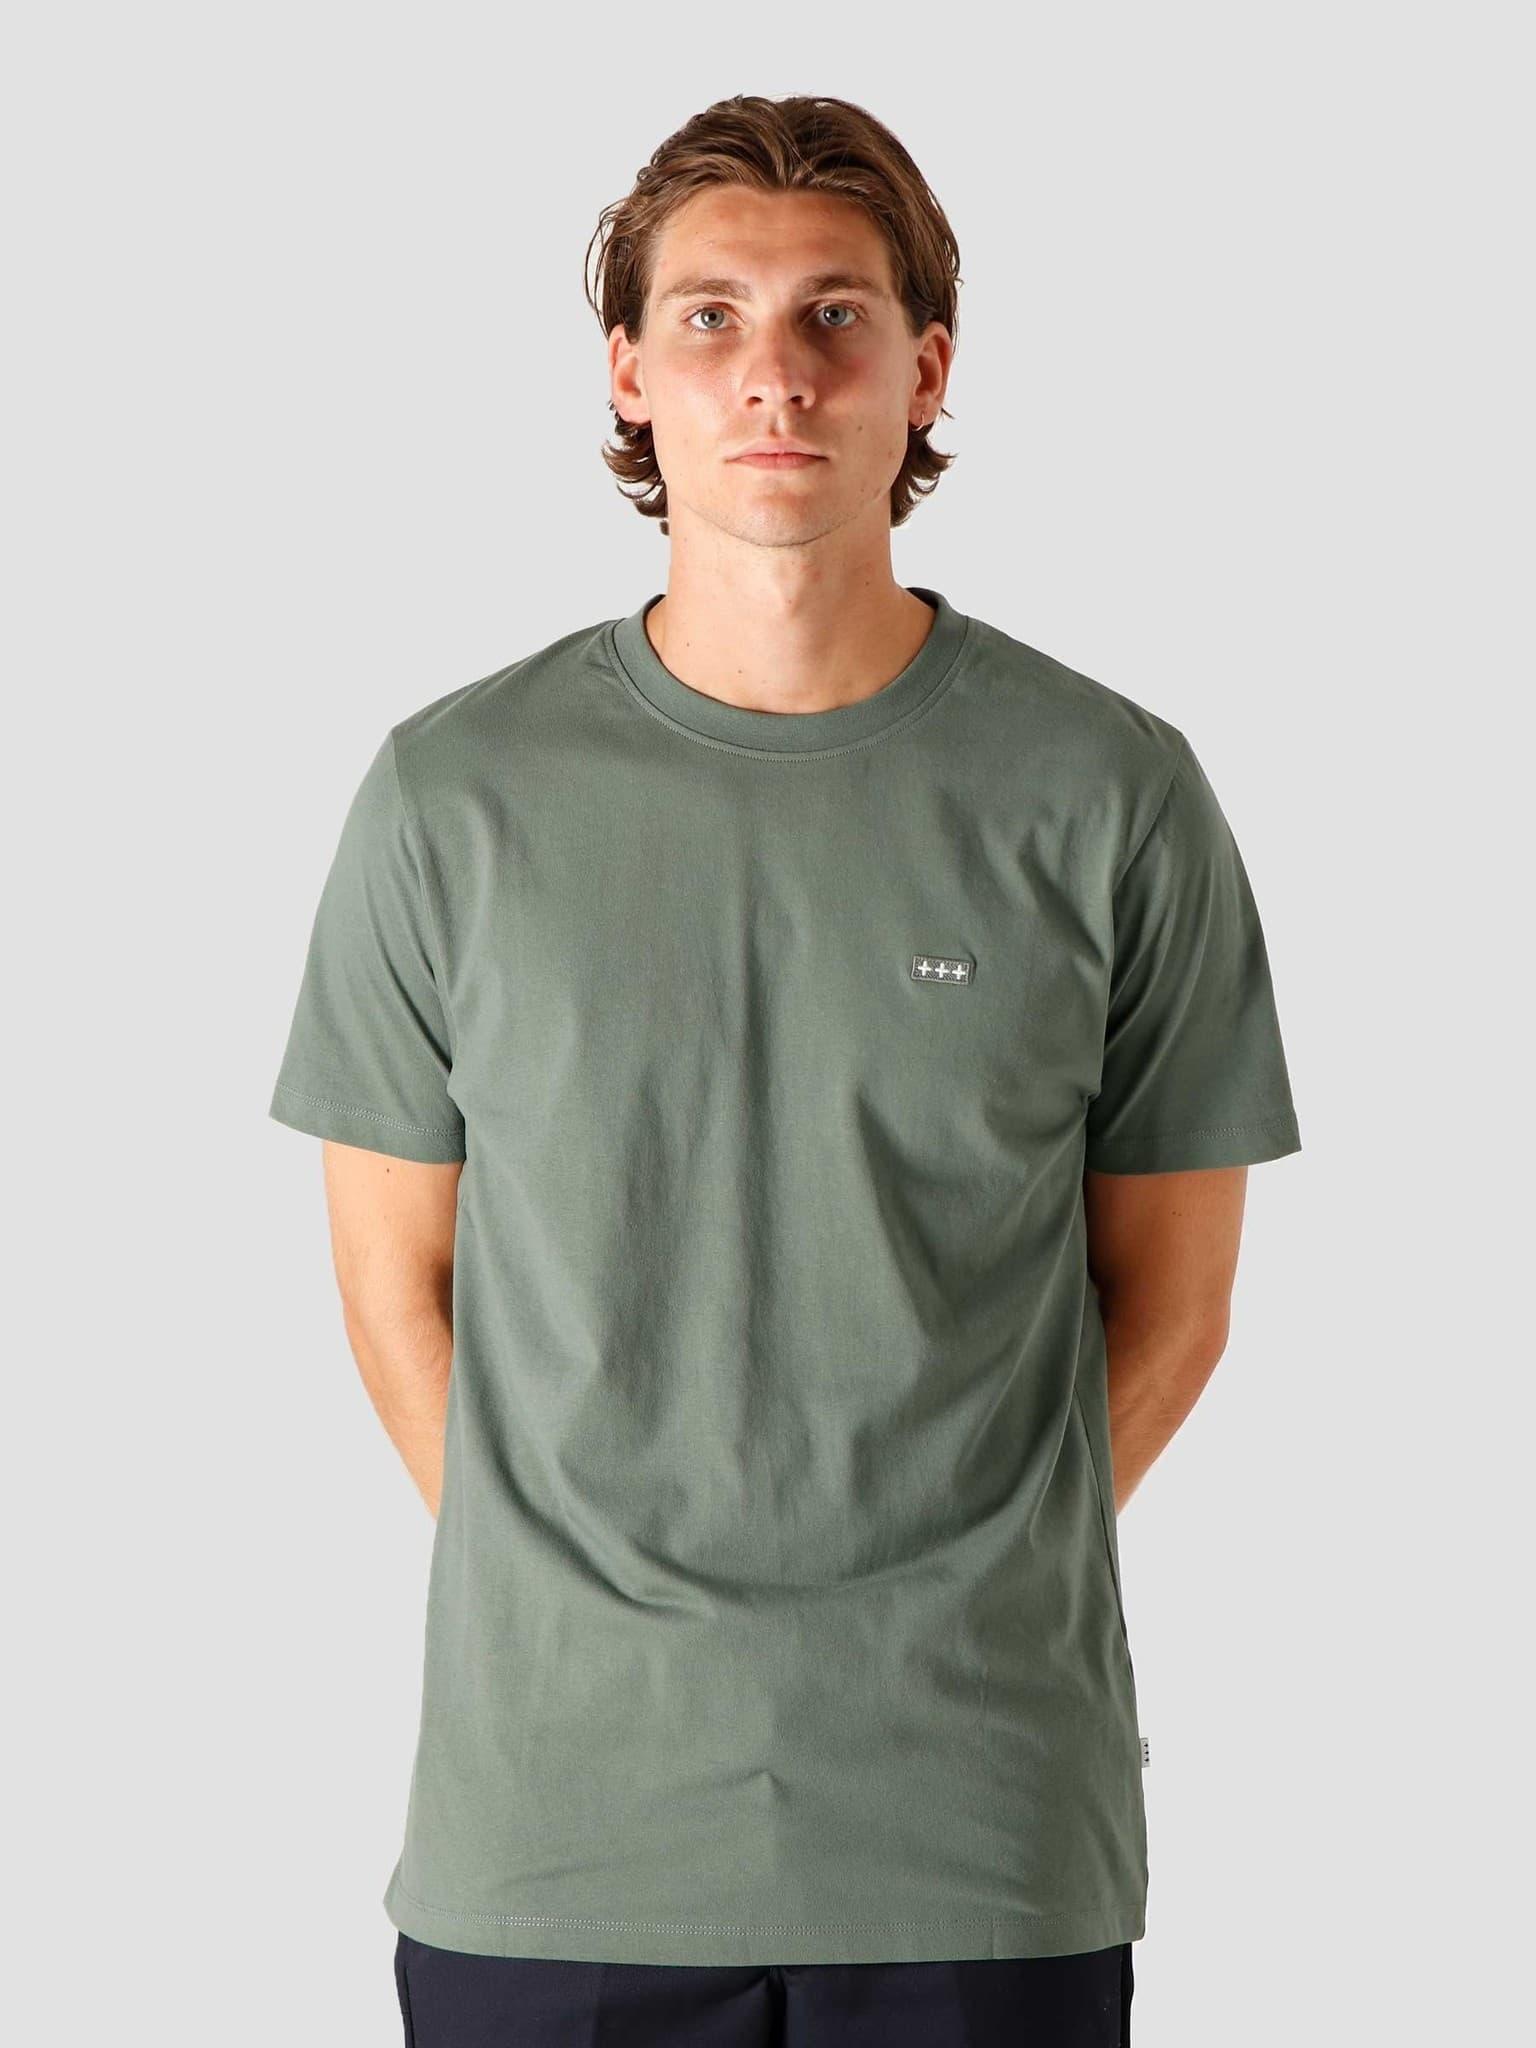 QB03 Patch Logo T-shirt Olive Green